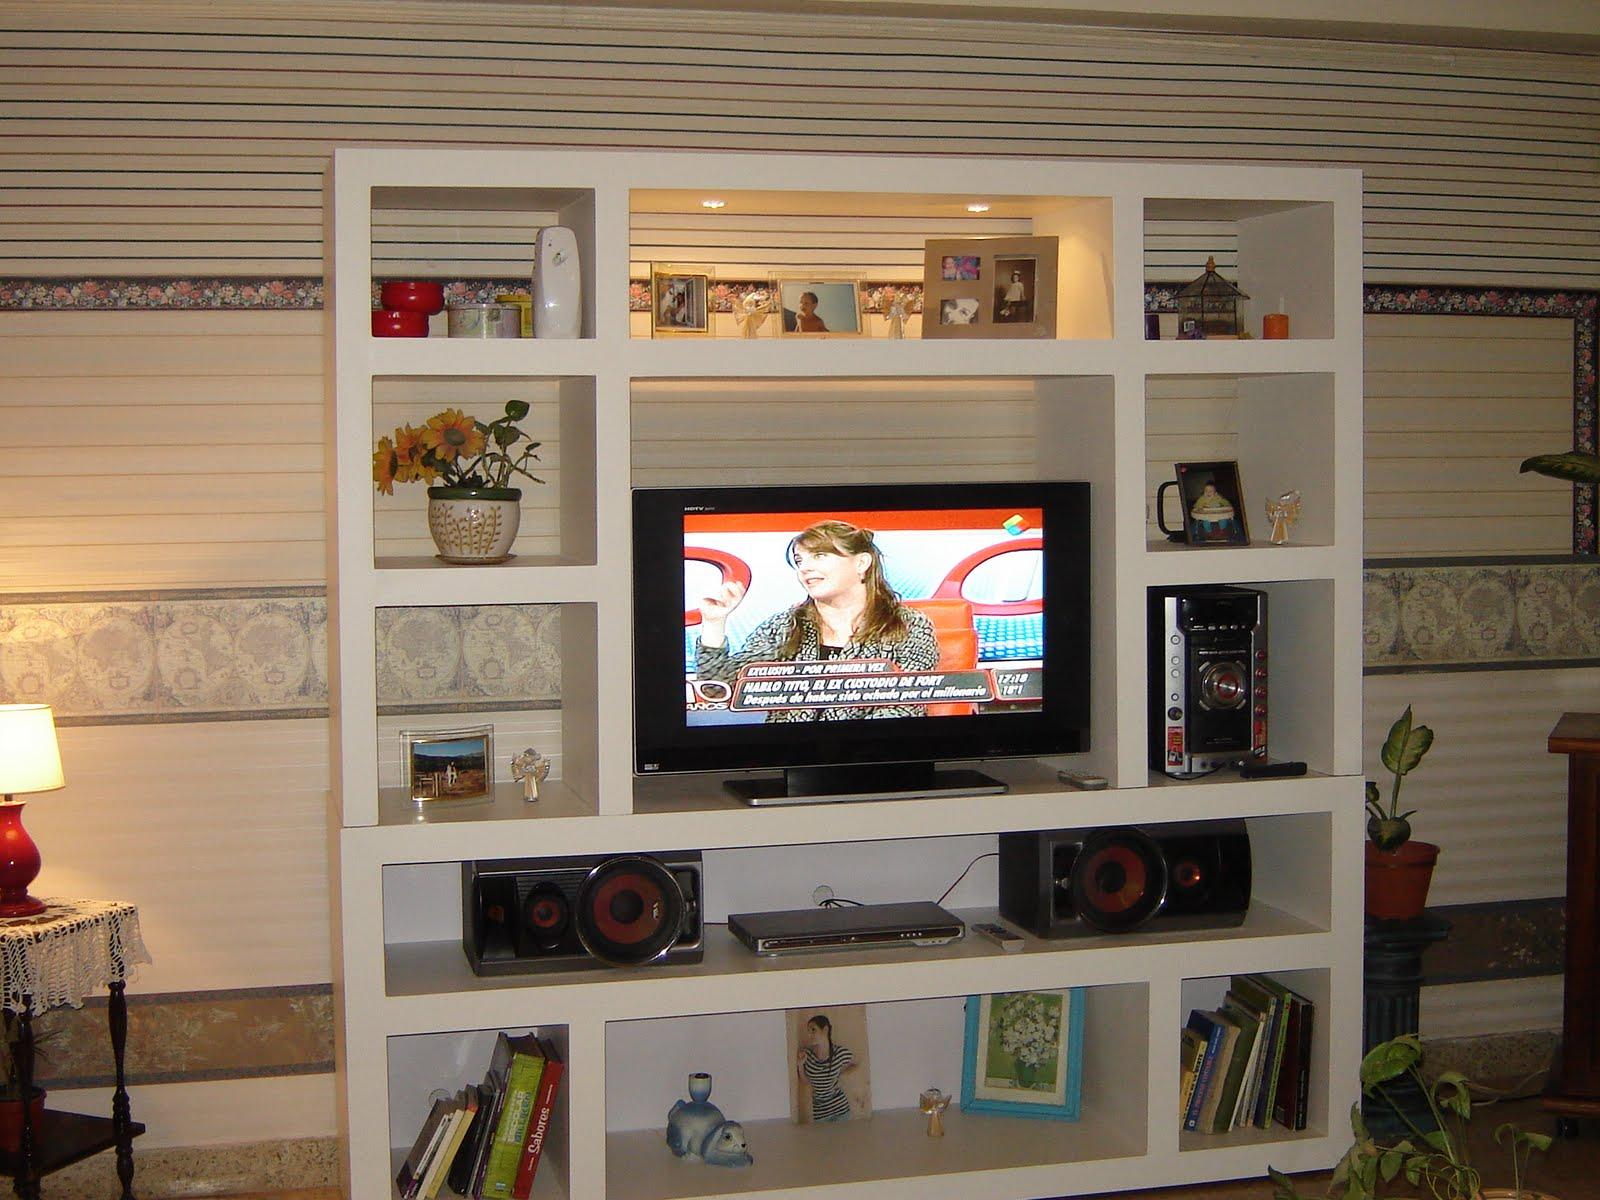 Dise os racks mueble para tv un dise o minimalista - Fotos muebles para tv ...